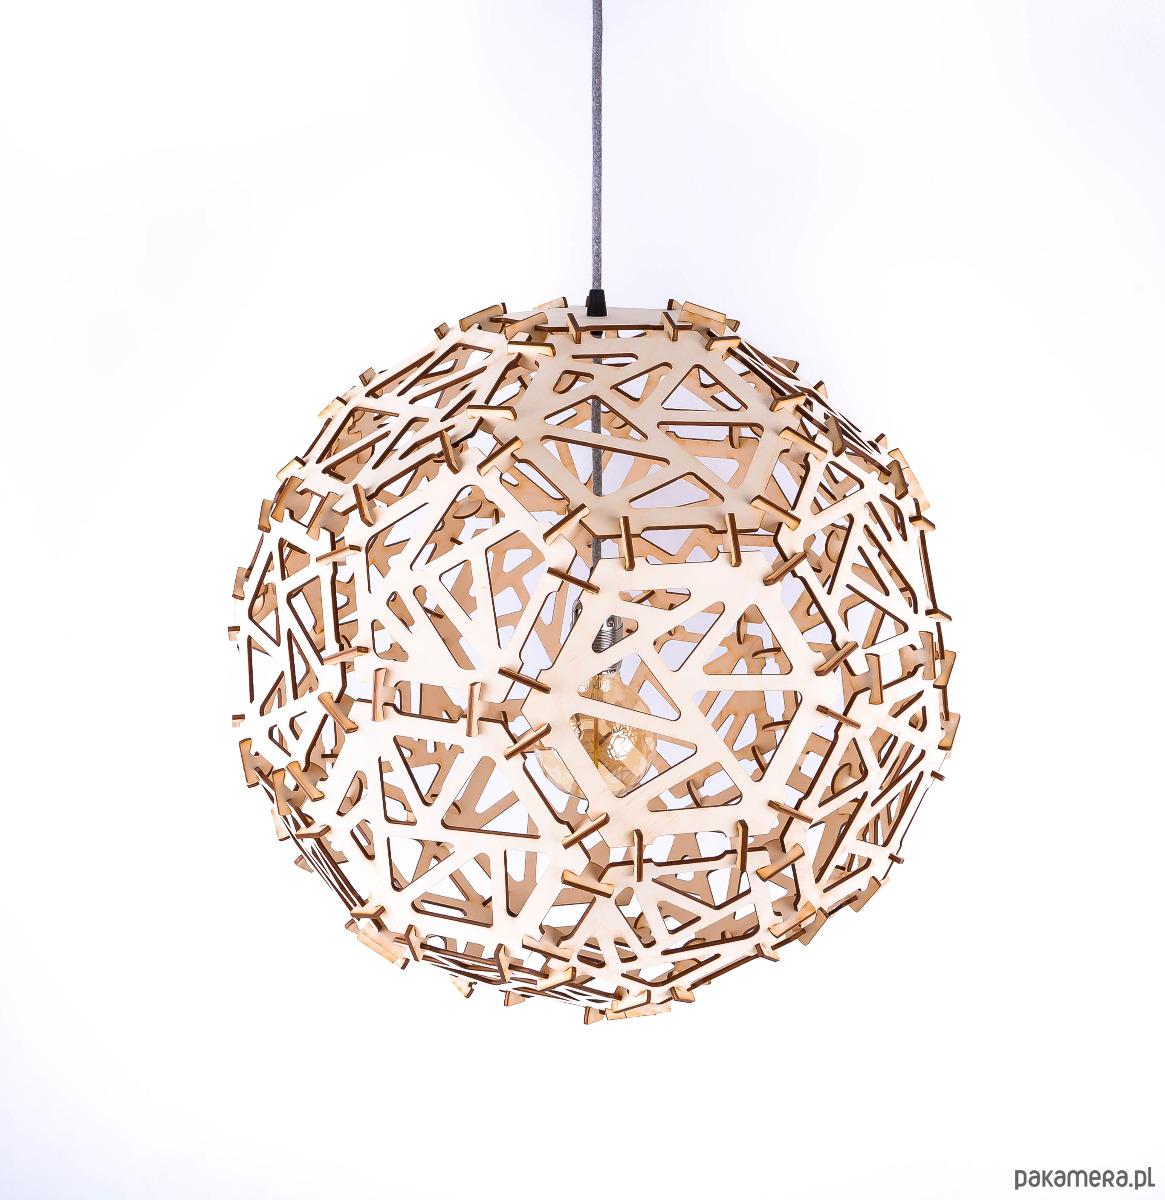 2527c2381a60 KULA wisząca sufitowa drewniana LAMPA do salonu - lampy - wiszące ...